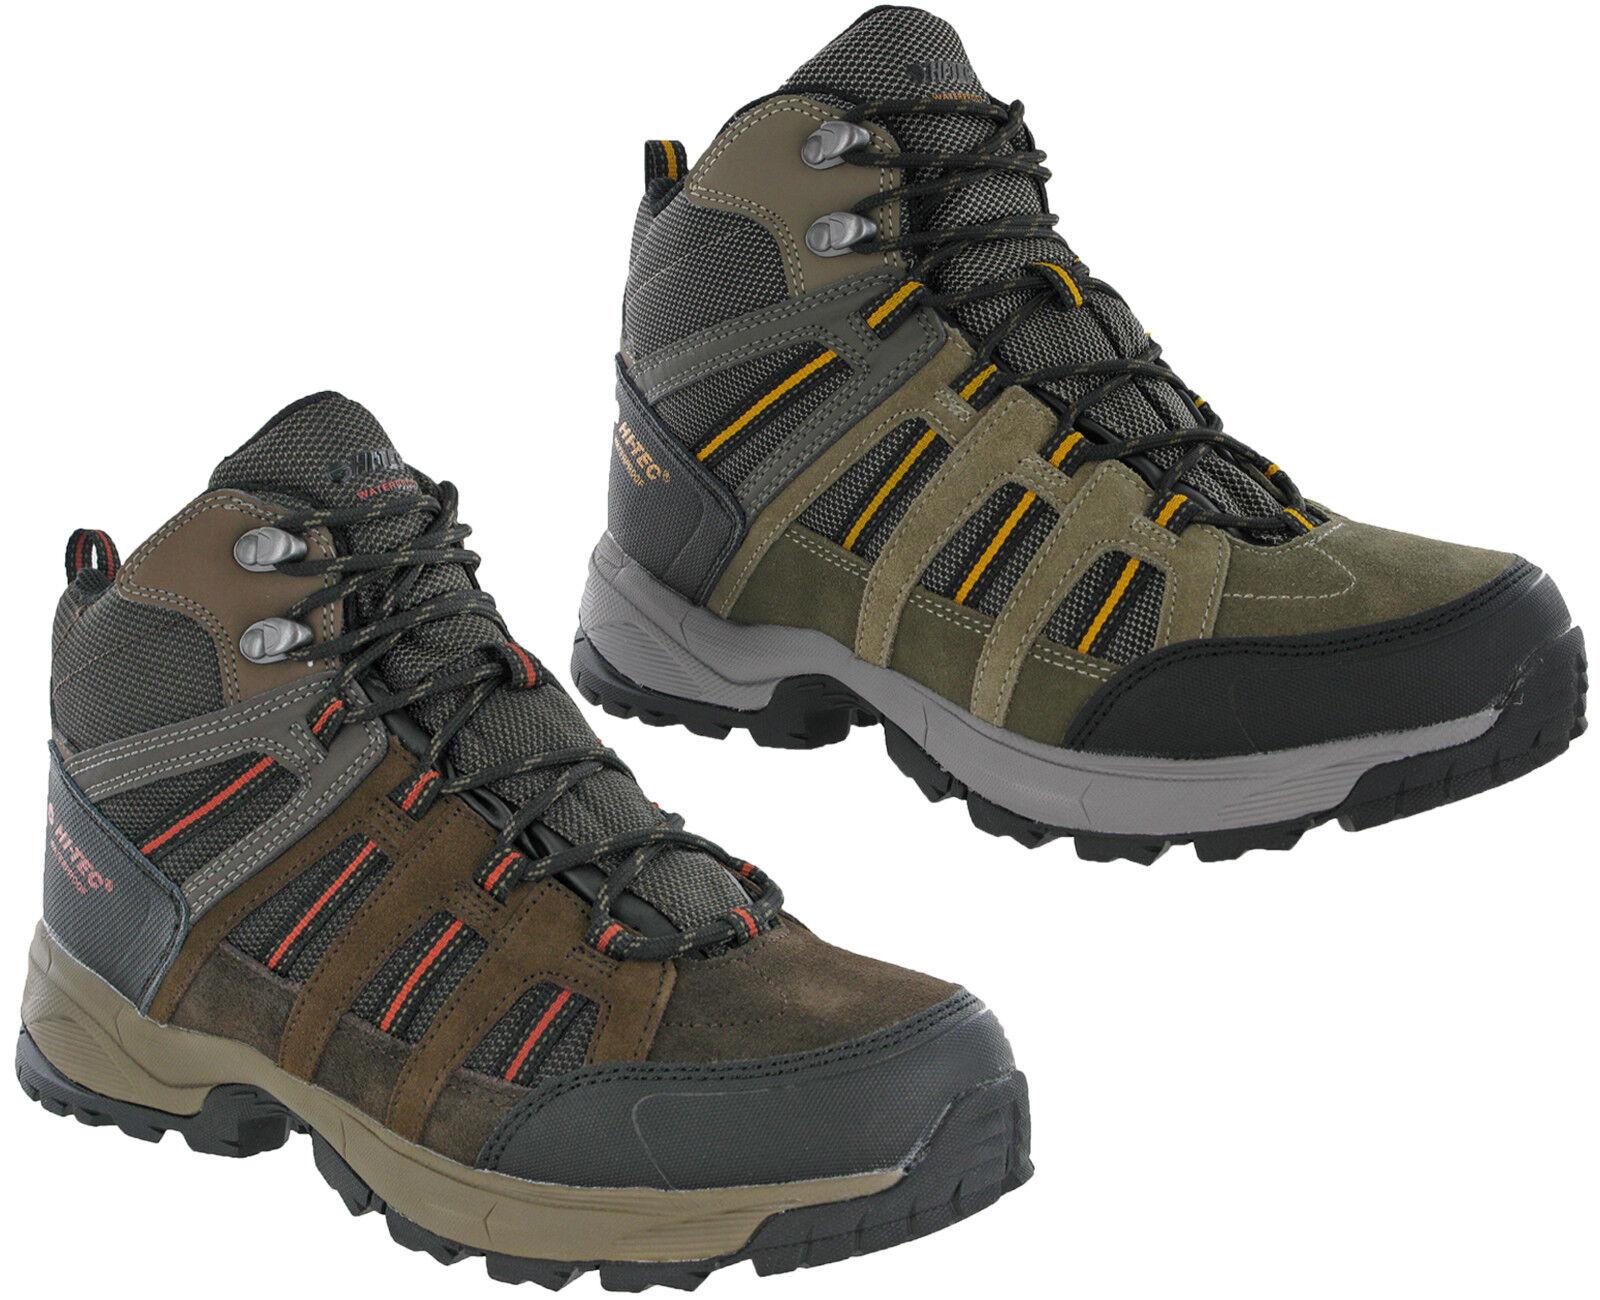 Hi-Tec Garcia Sport Wasserfest Stiefel Wandern Trail Herren Wandern Schuhe